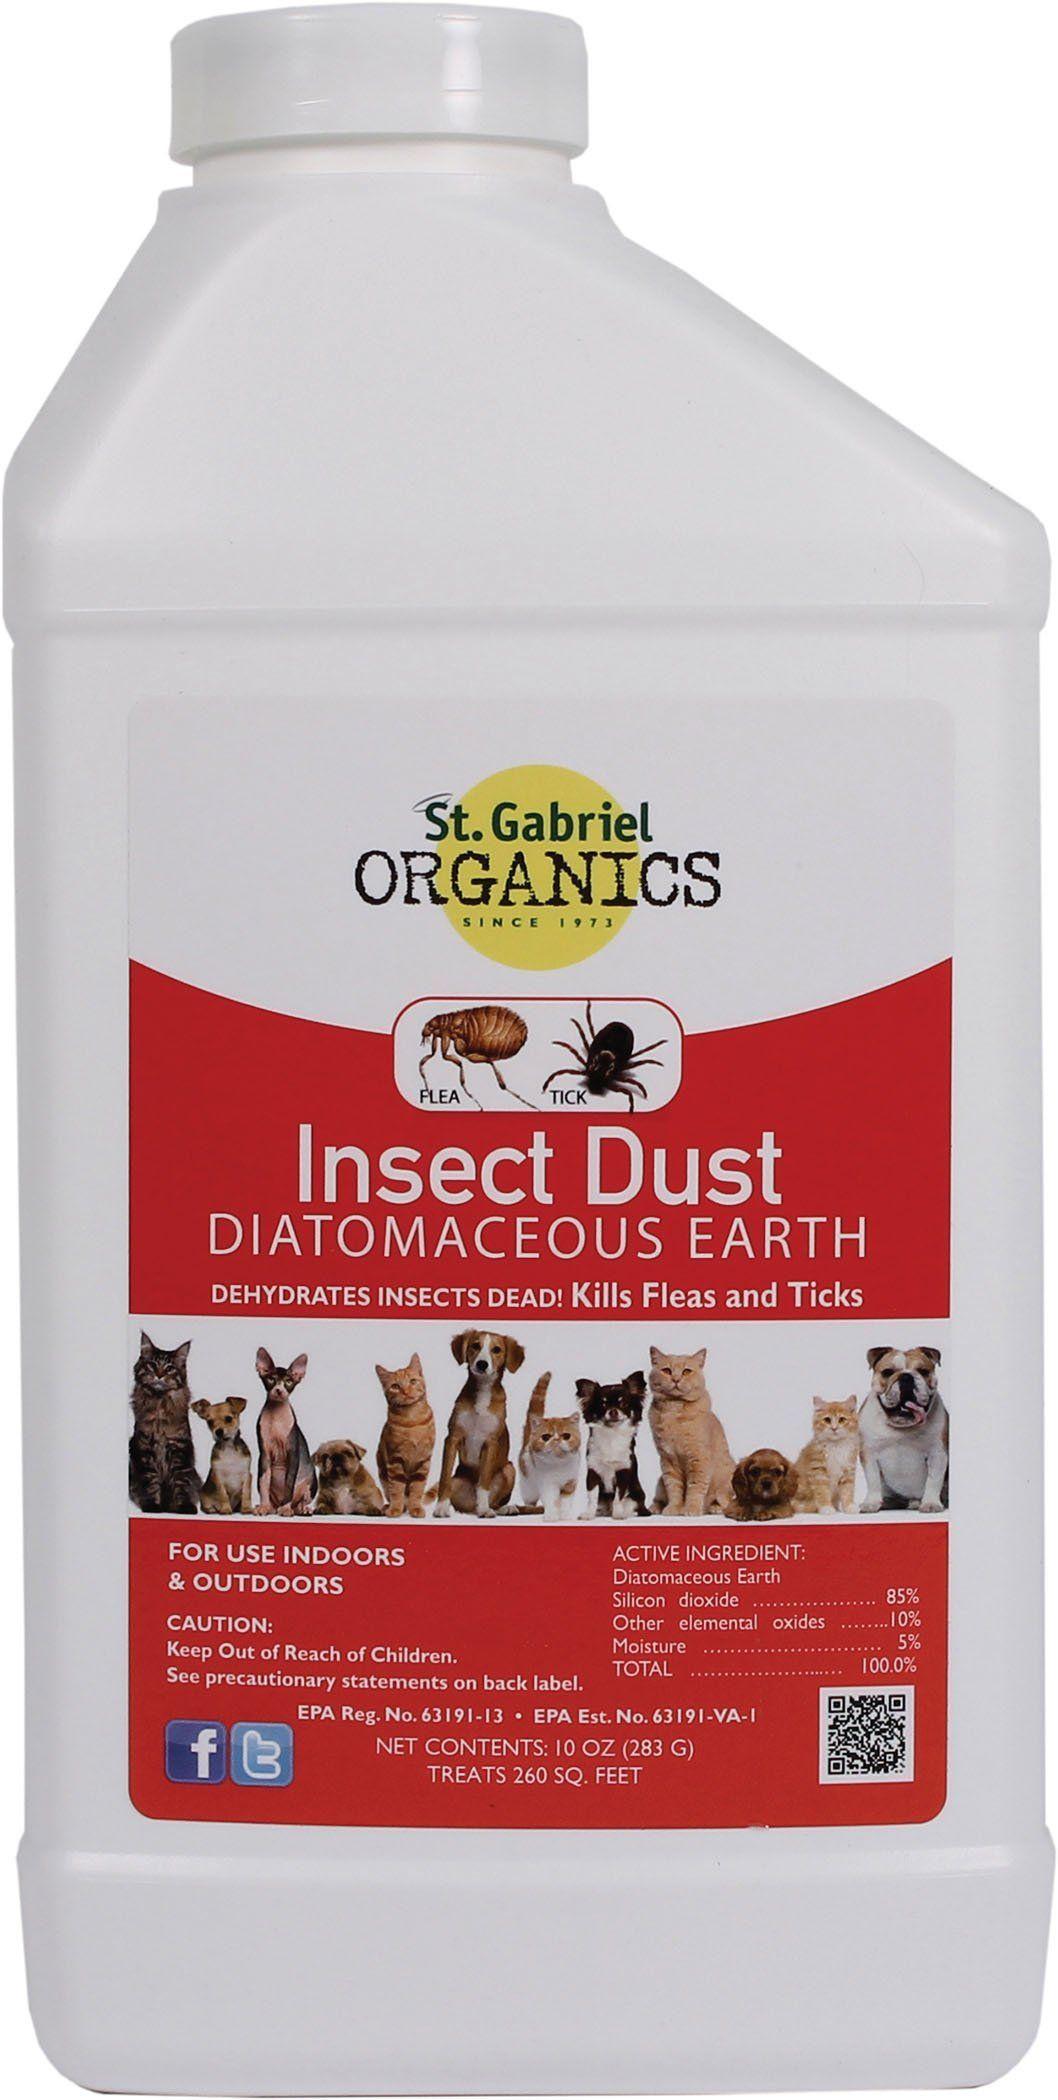 St Gabriel OrganicsInsect Dust Diatomaceous Earth Flea